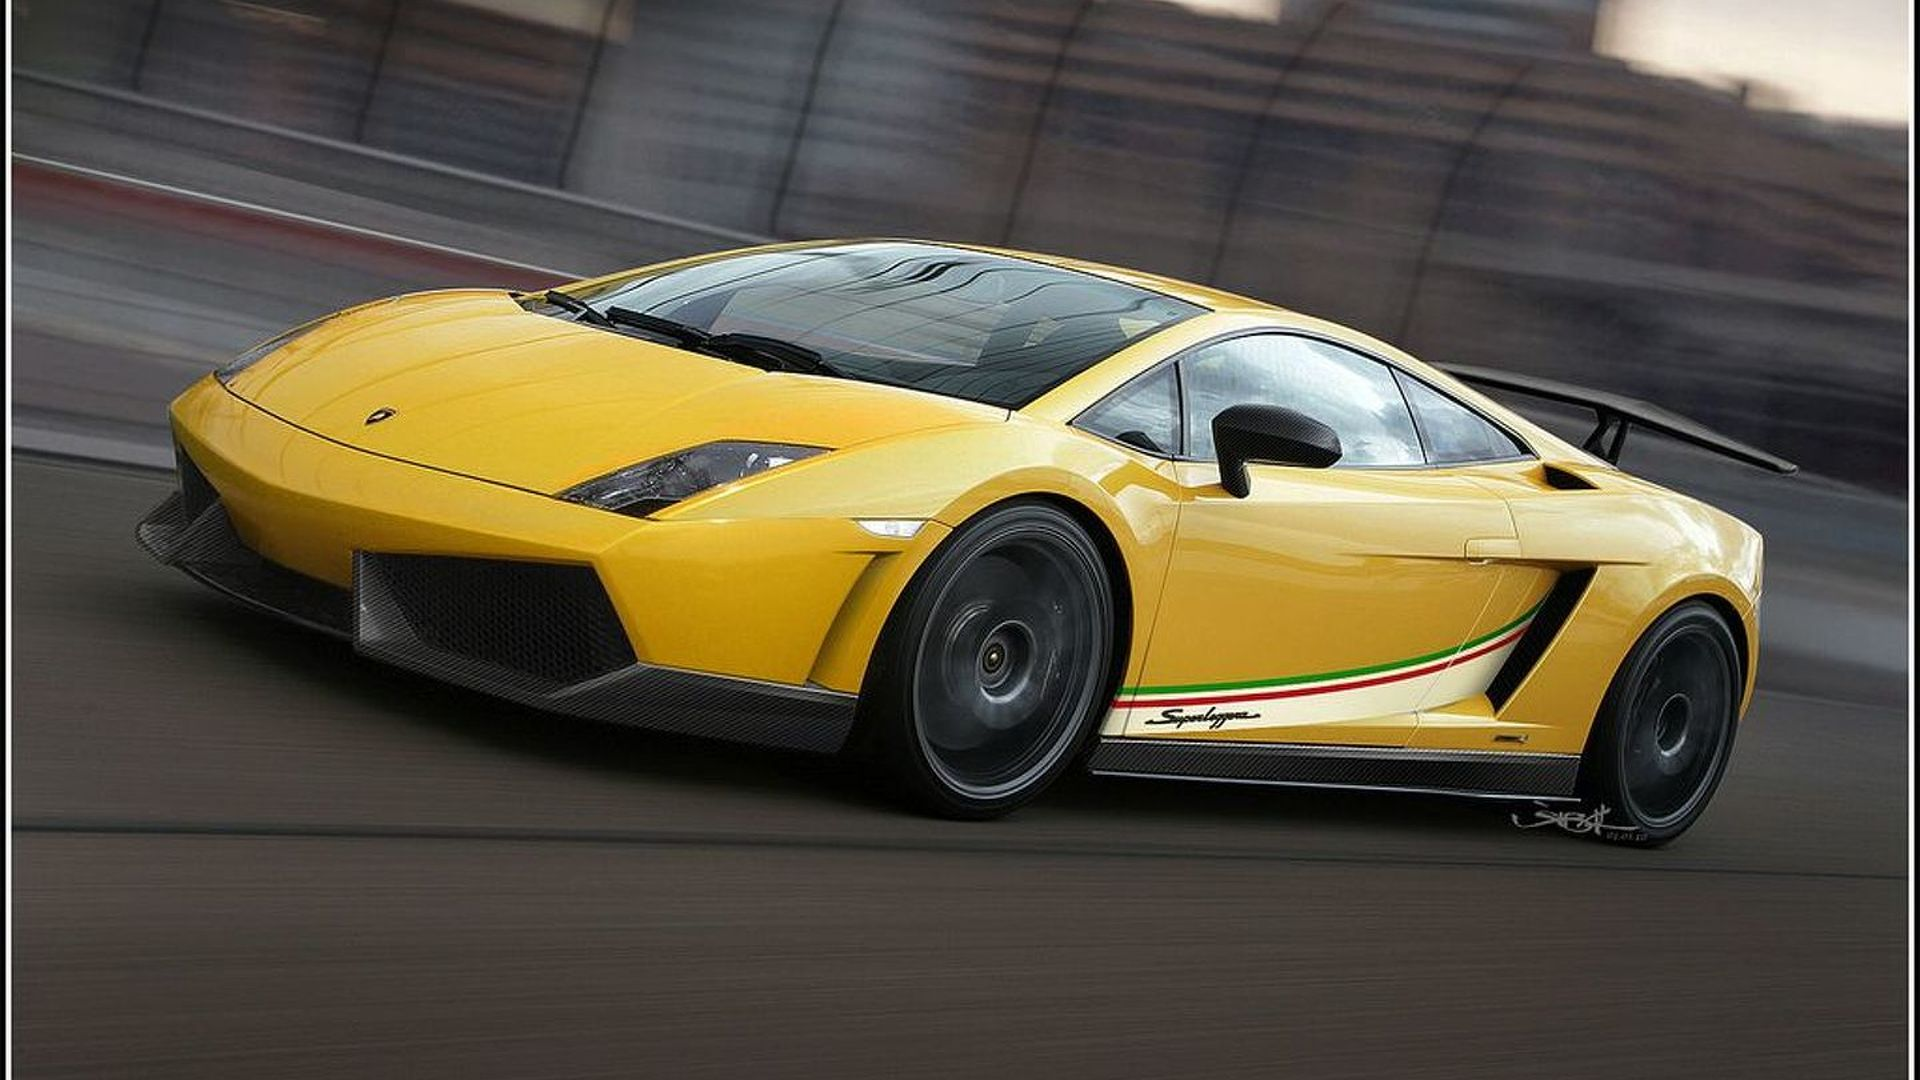 Superior Lamborghini Gallardo LP570 4 Superleggera Further Details And Renderings  Surface